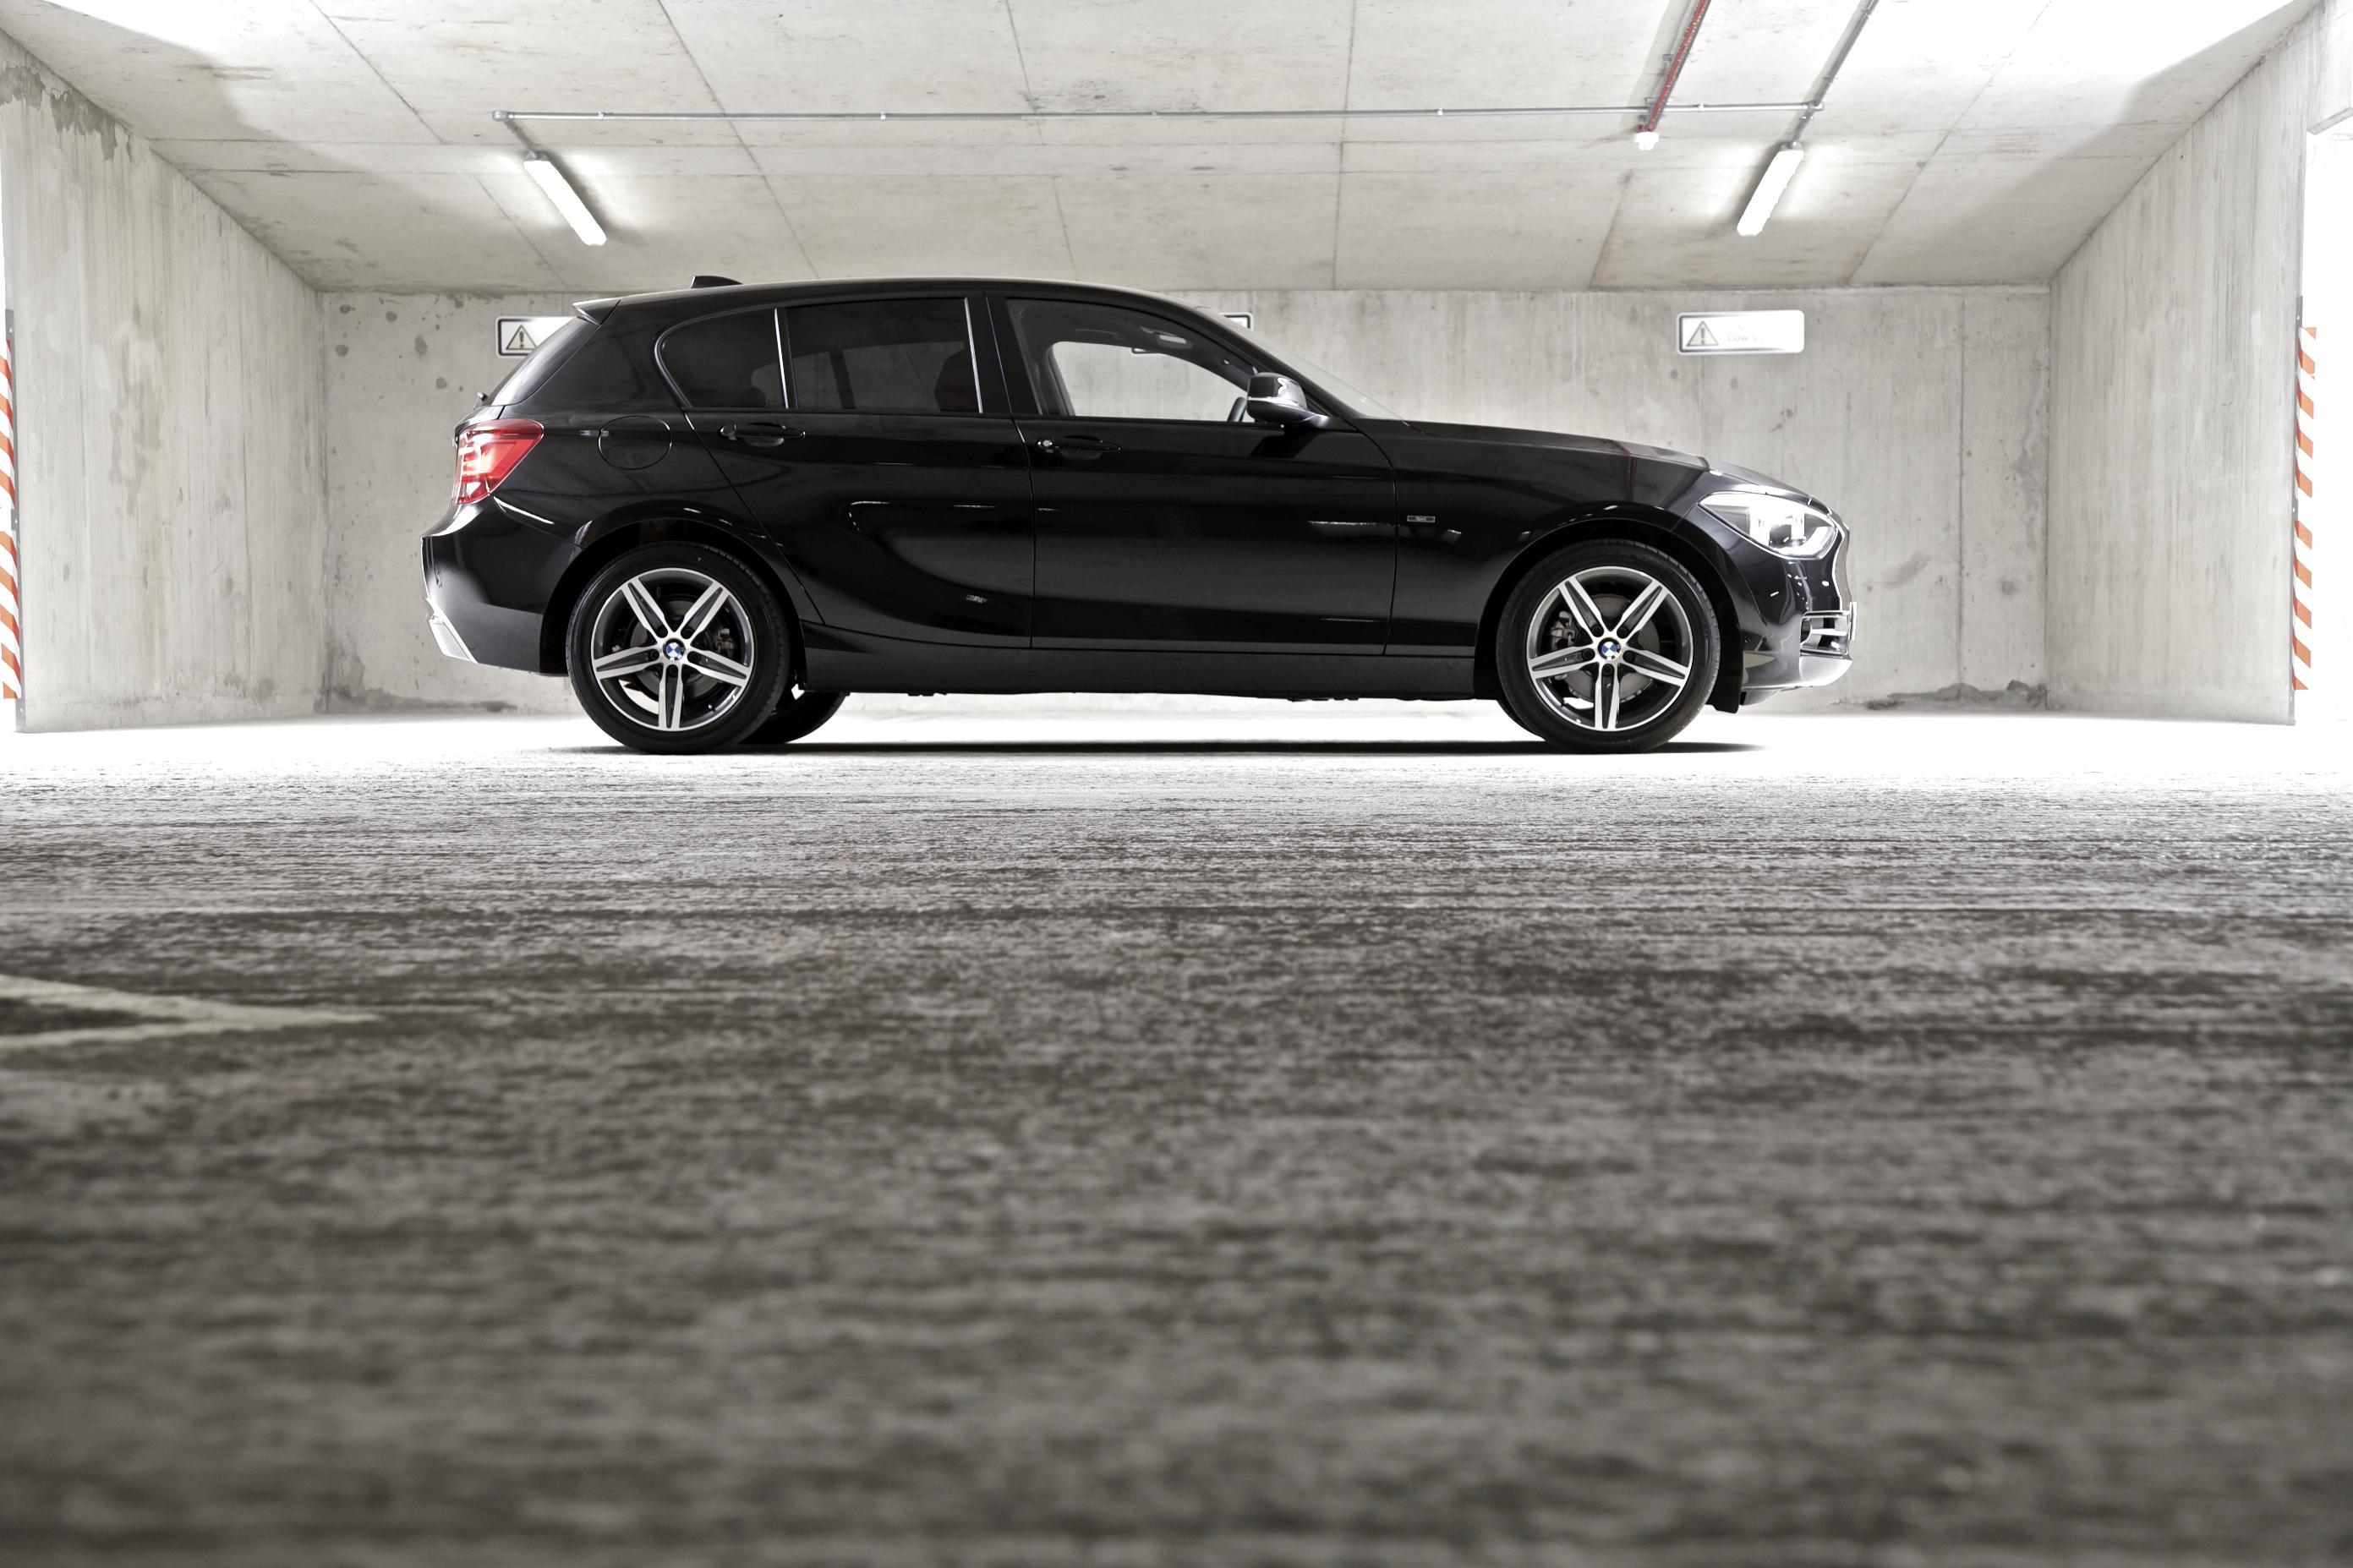 BMW 1 Series (2011) 4